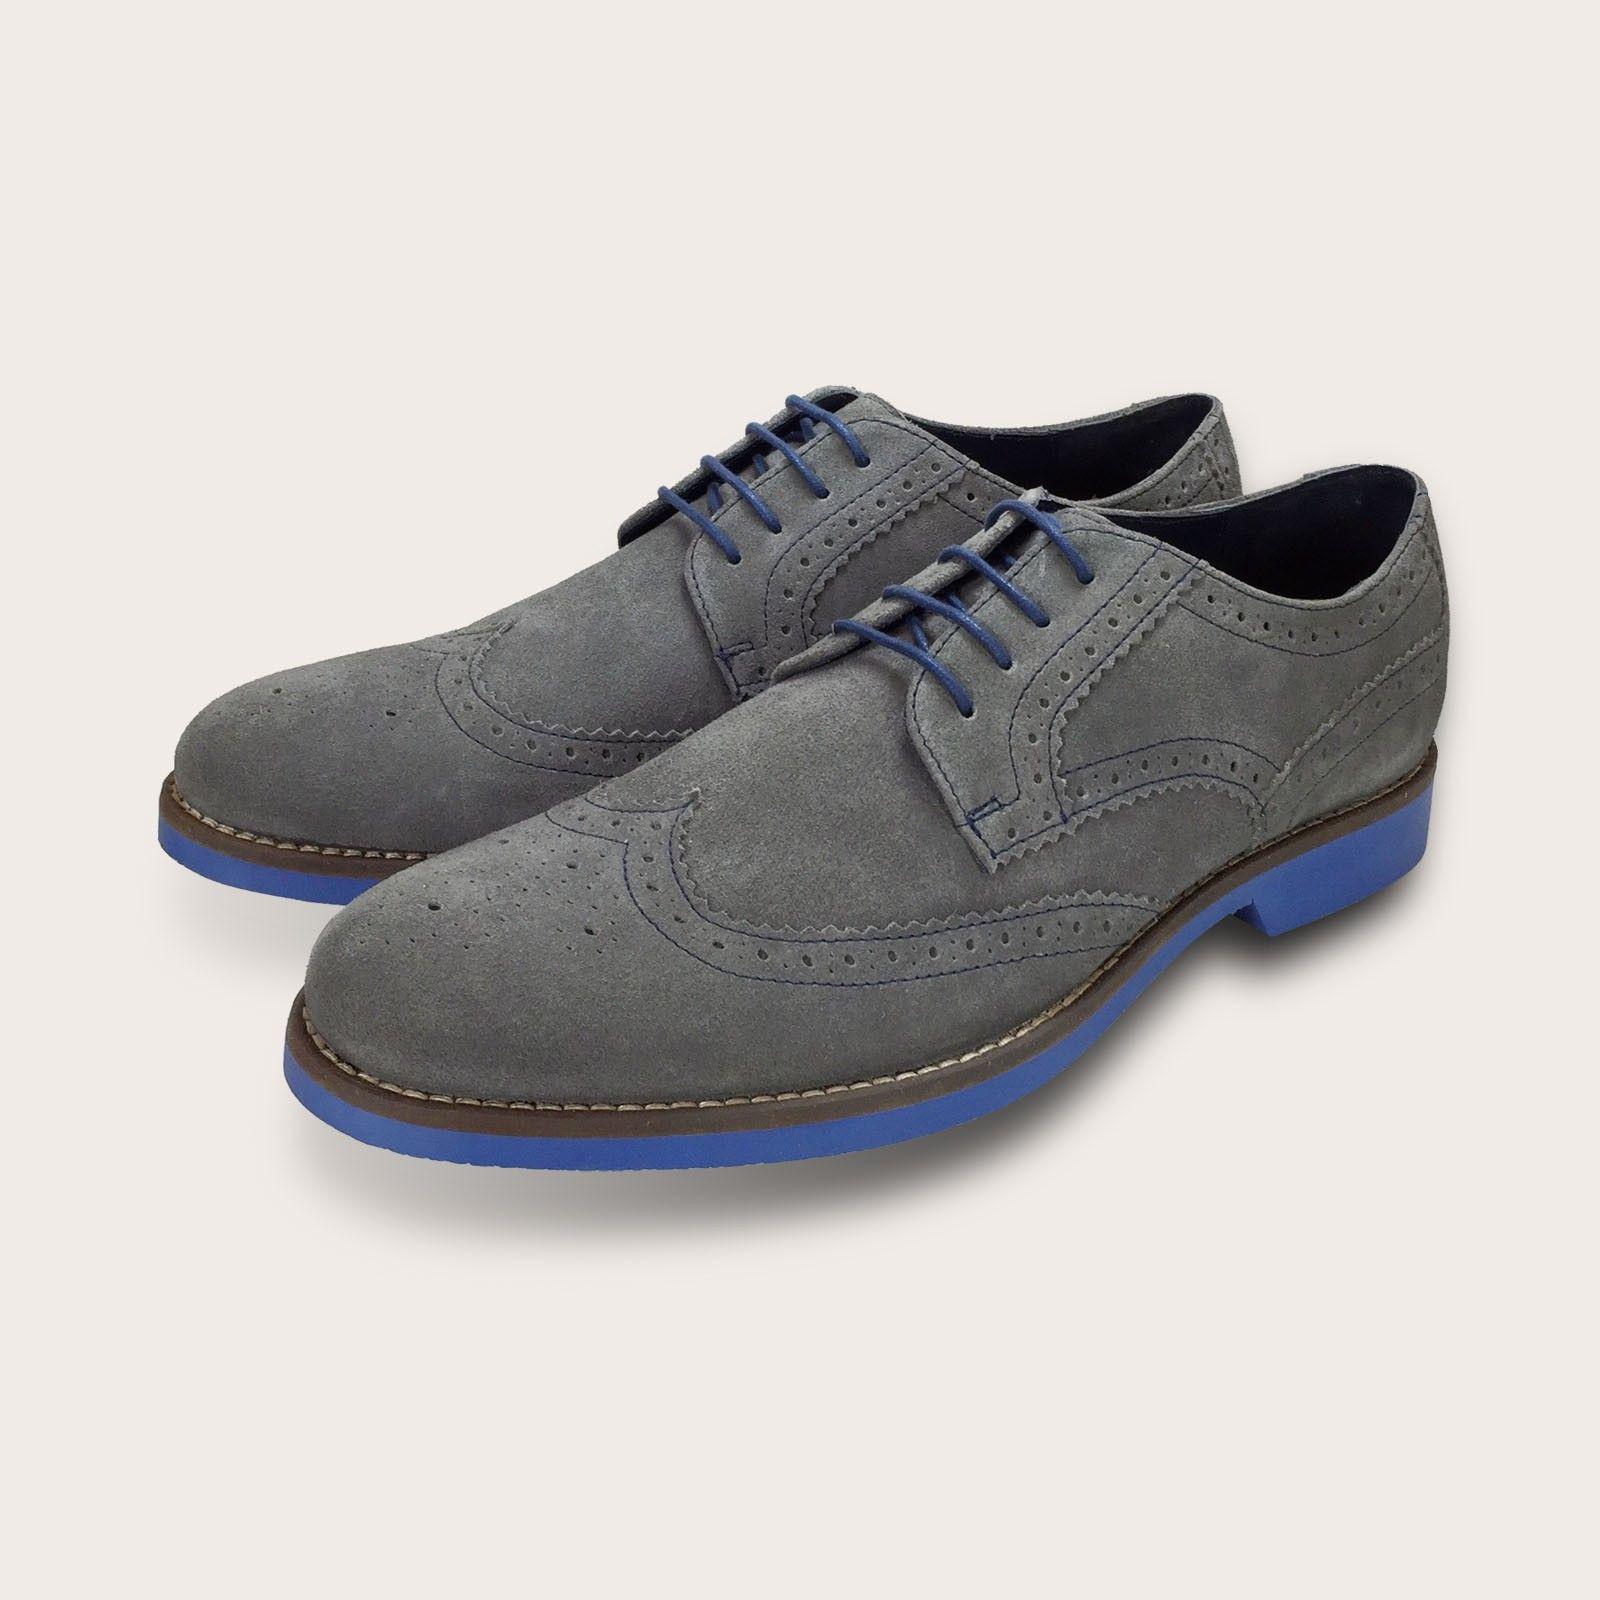 Men S Grey Suede Brogue Shoes Blue Soles By Coogan London Brogues Men Dress Shoes Men Brogue Shoes